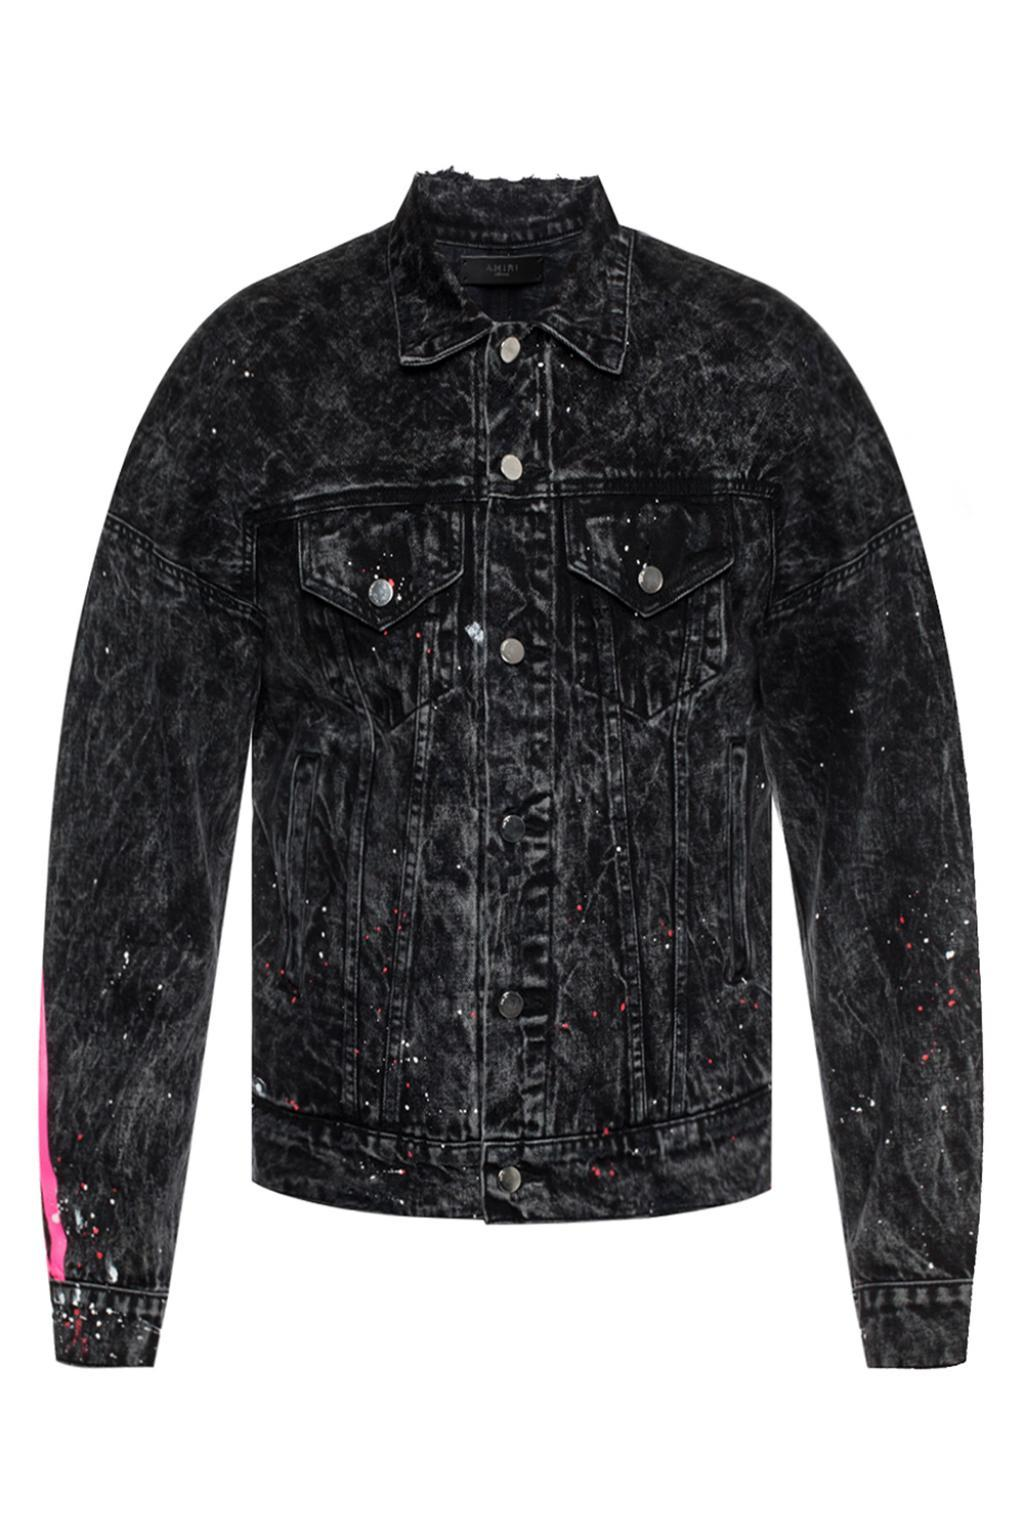 7aa9c496fa2 Lyst - Amiri Denim Jacket With Printed Stripes for Men